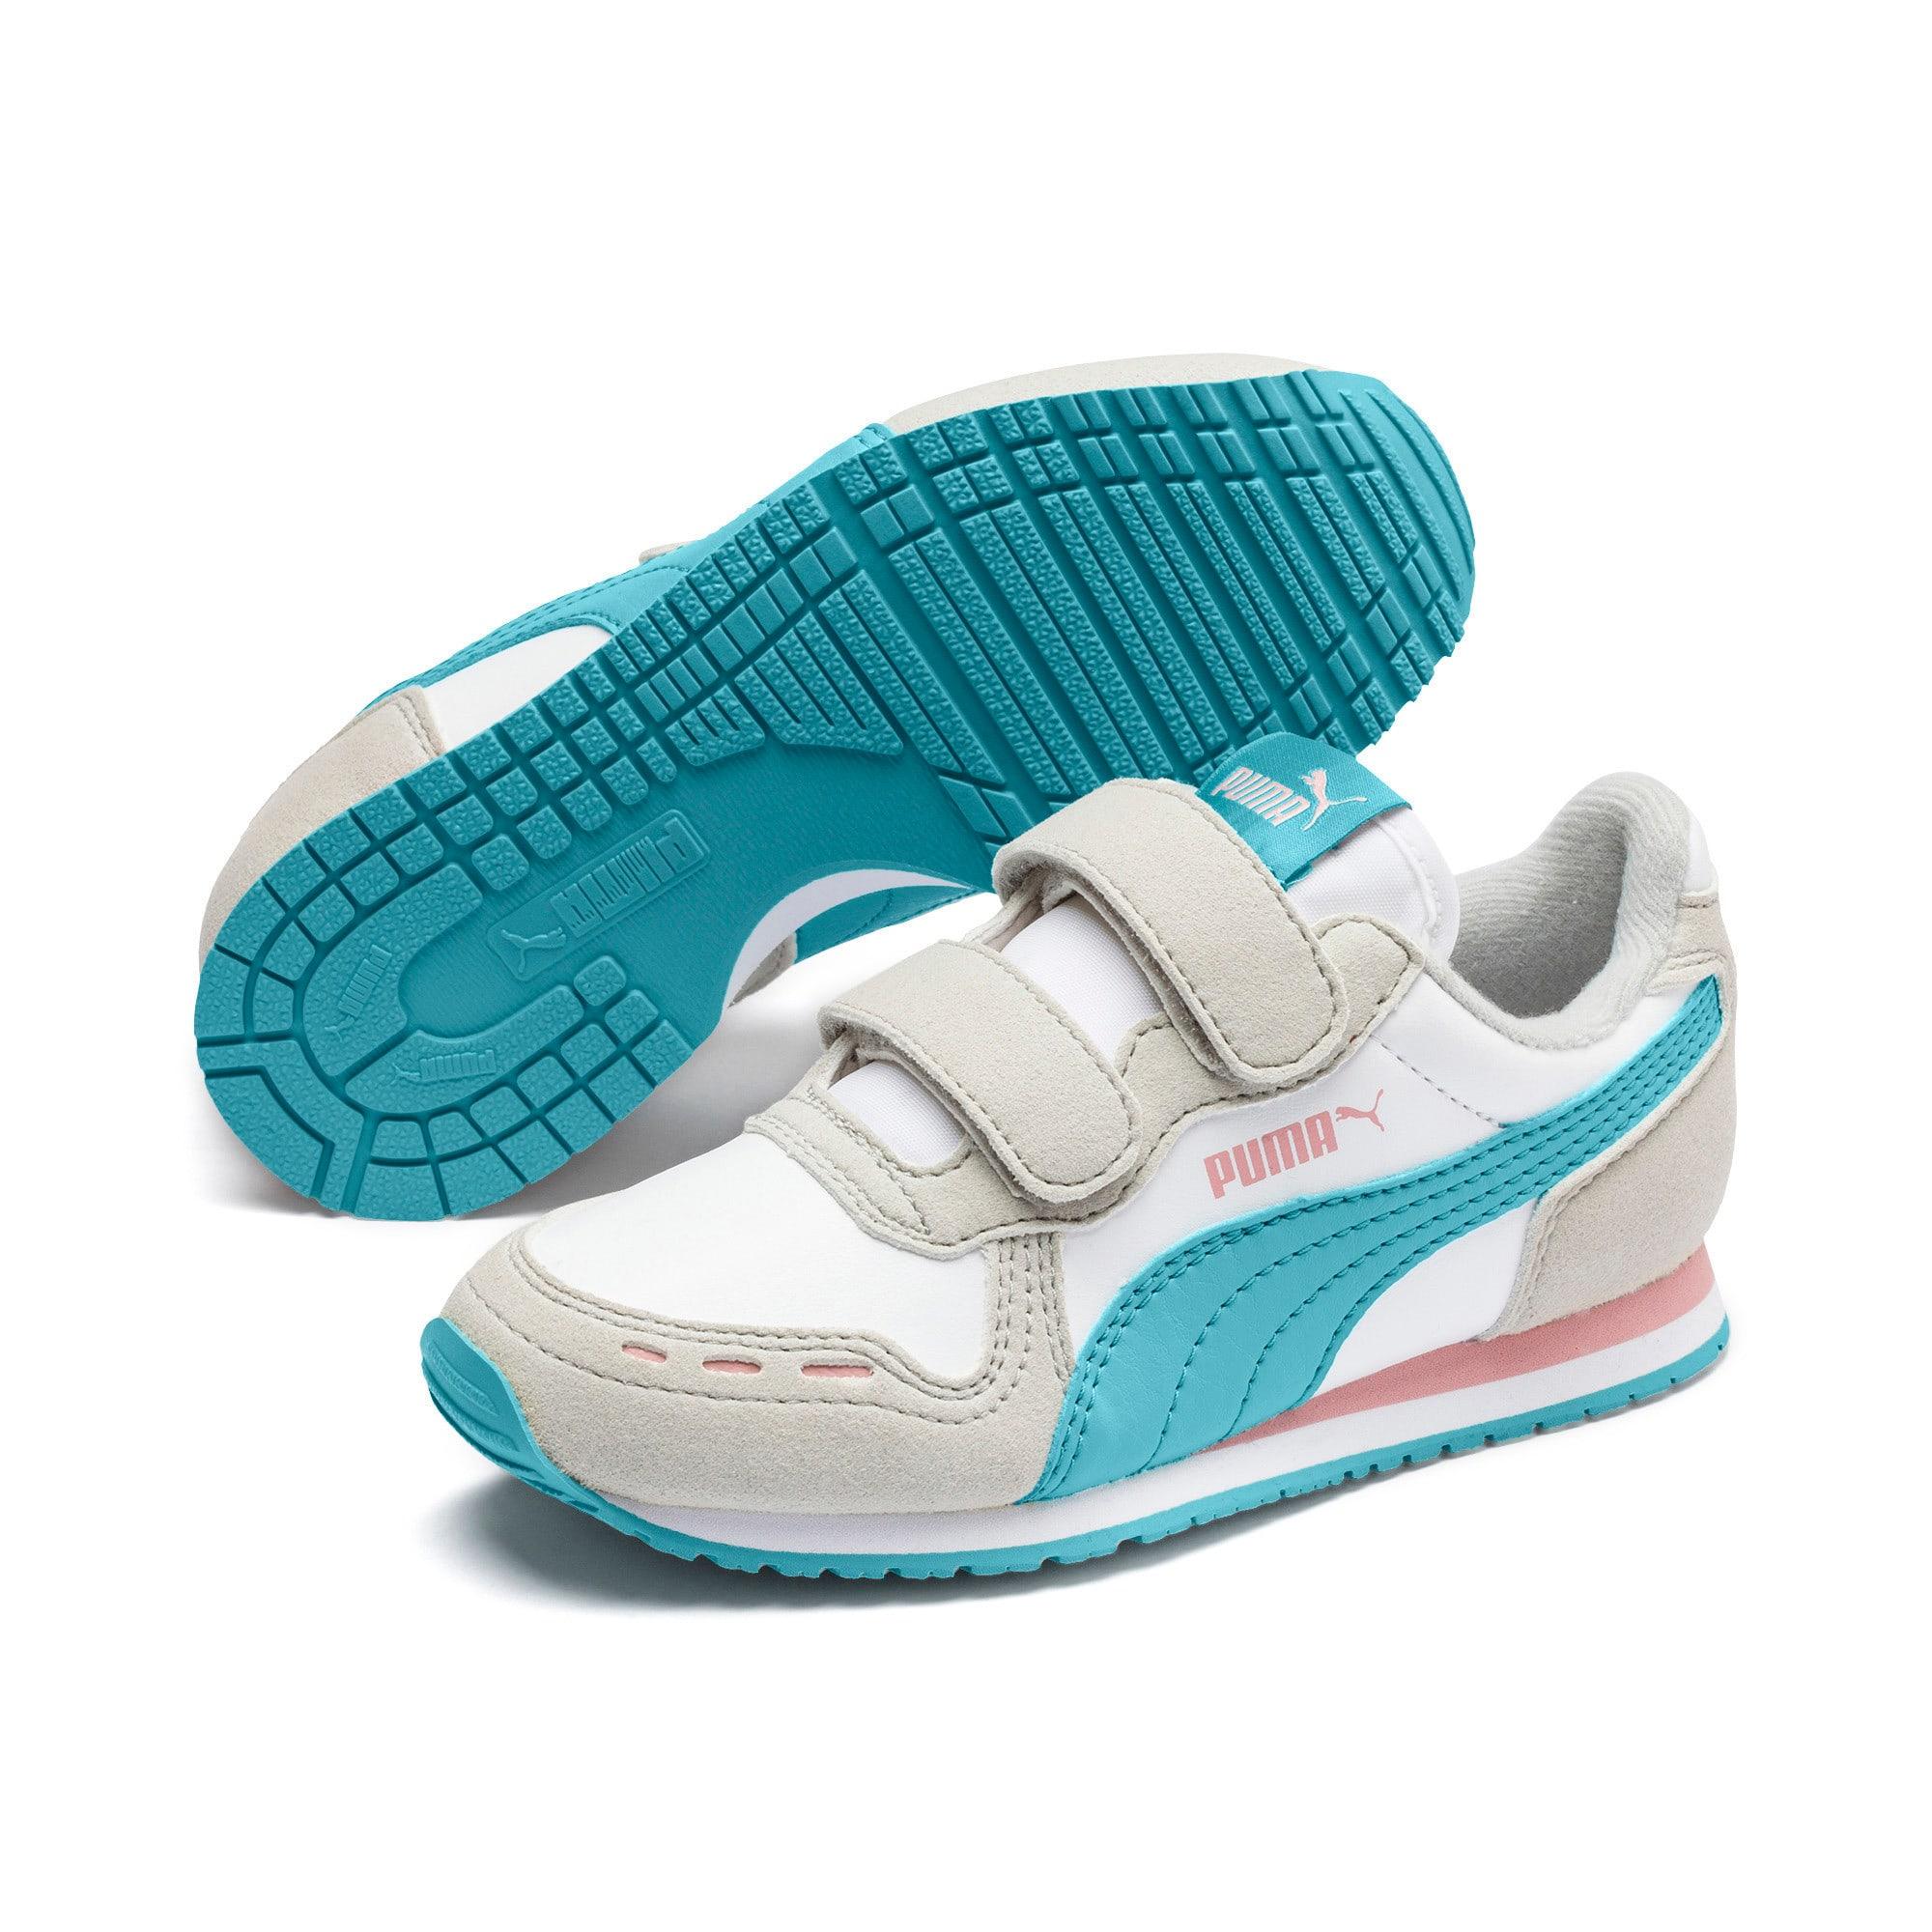 Thumbnail 2 of Cabana Racer SL AC Little Kids' Shoes, Puma White-Milky Blue, medium